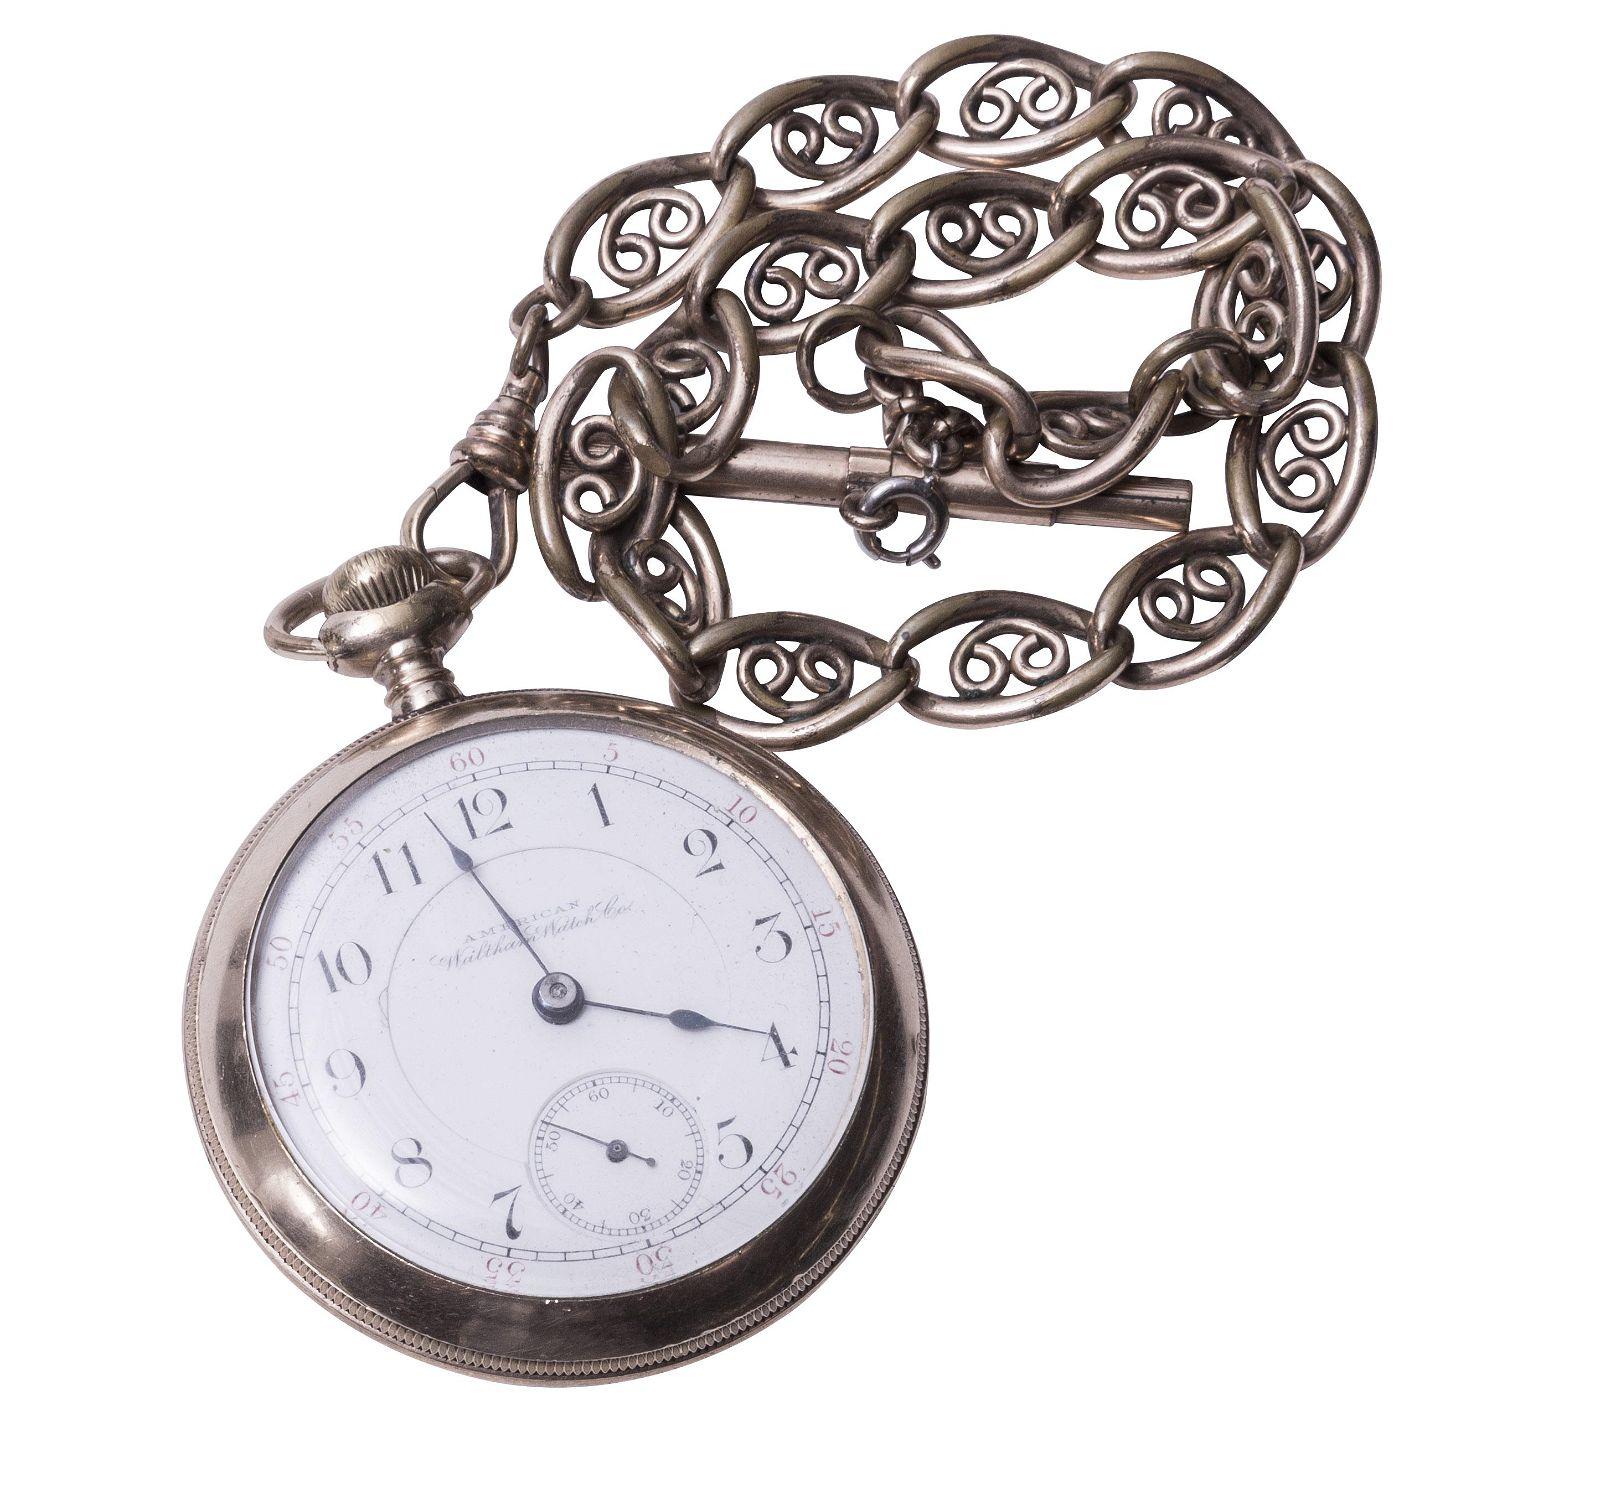 Waltham Watch Co. Pocket Watch